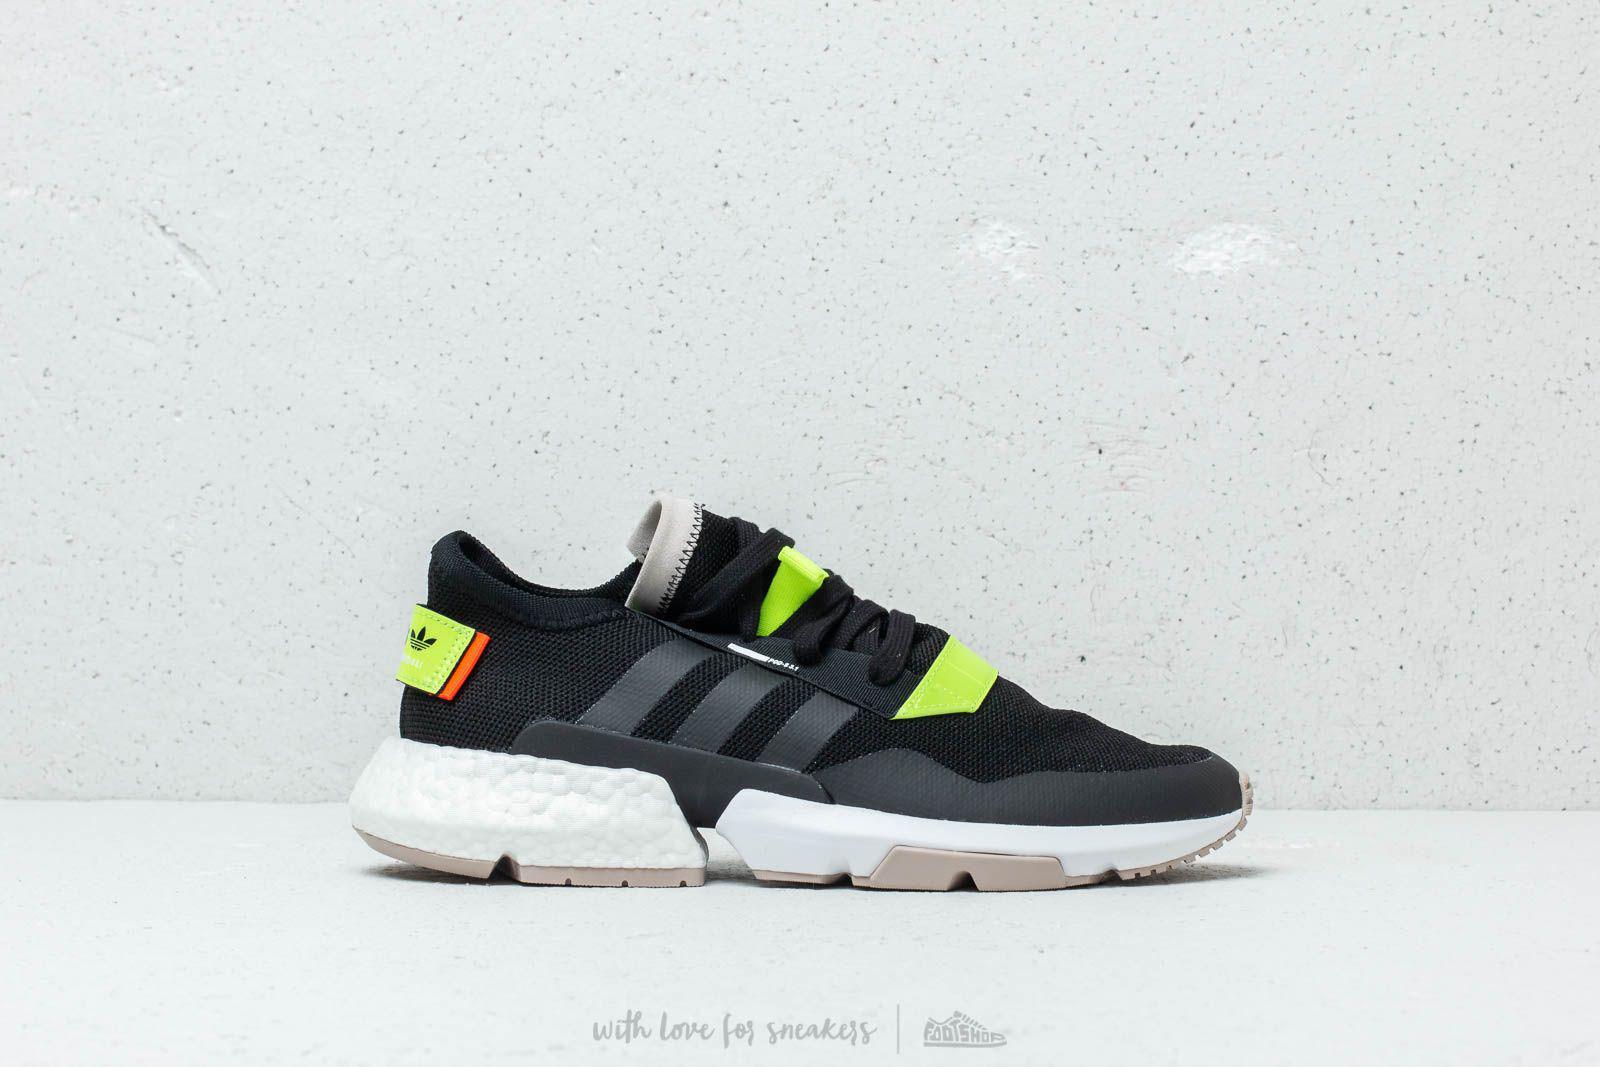 reputable site d609b c073f Lyst - adidas Originals Adidas Pod-s3.1 Core Black Solar Yel